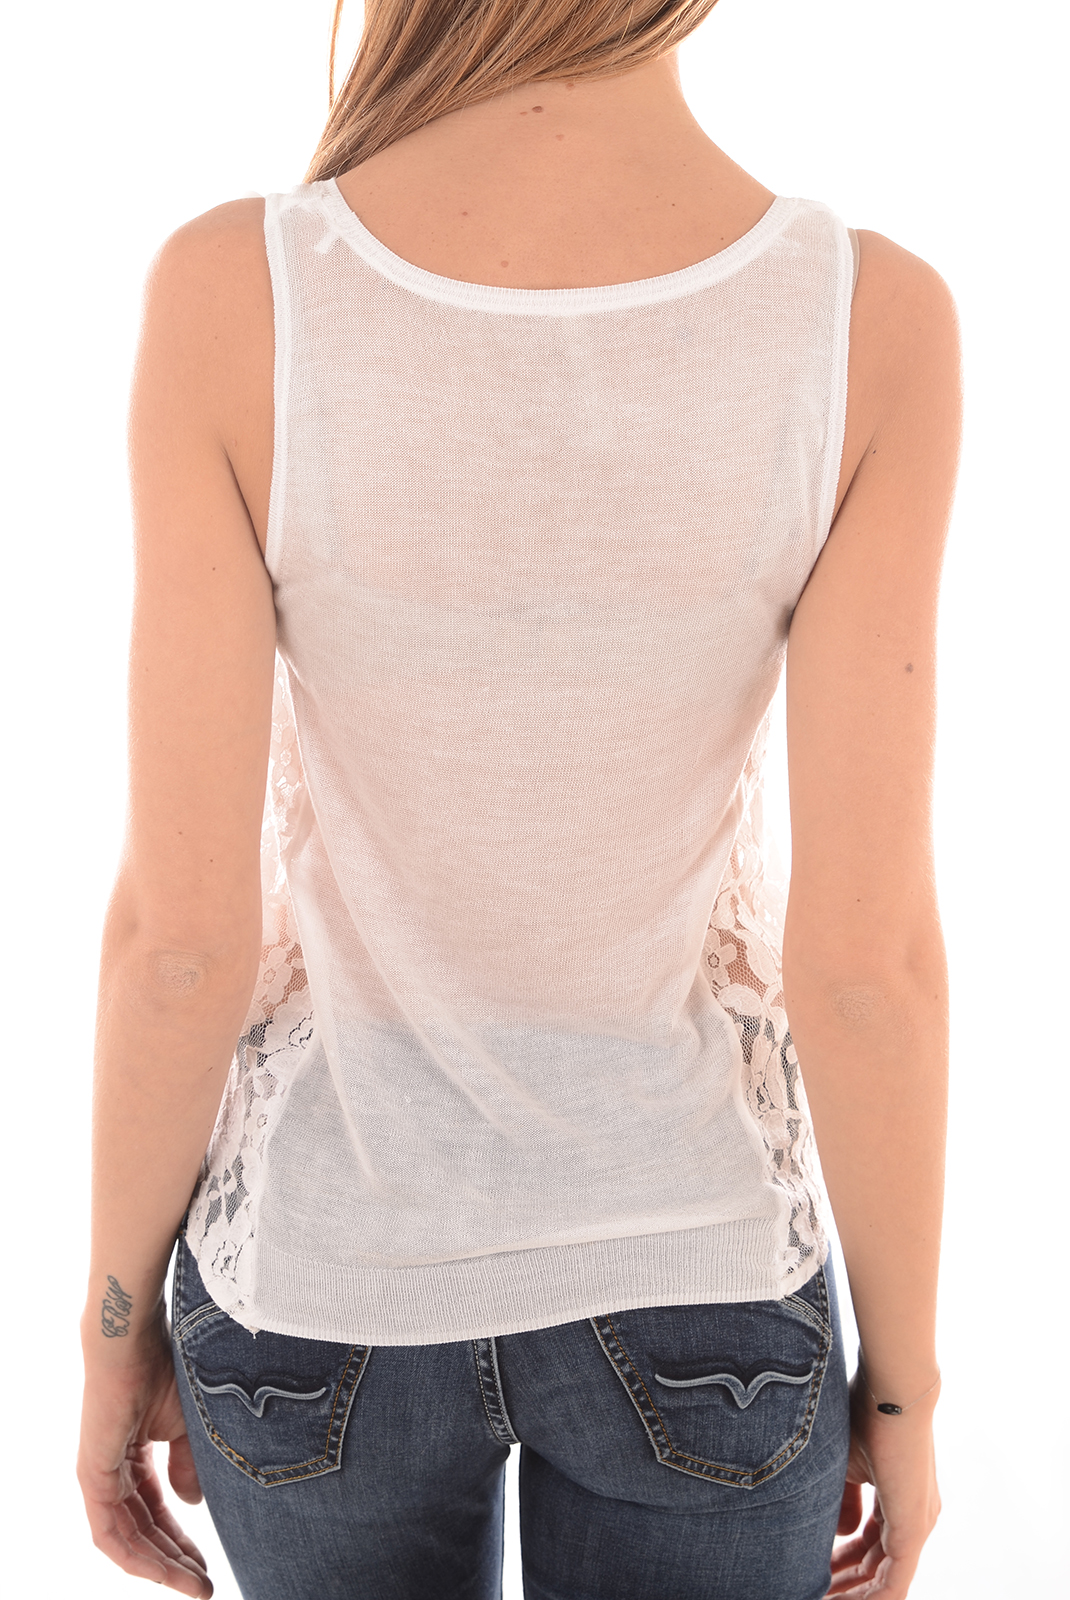 Tops & Tee shirts  Guess jeans W61R48Z0NJ0 A000 BLANC